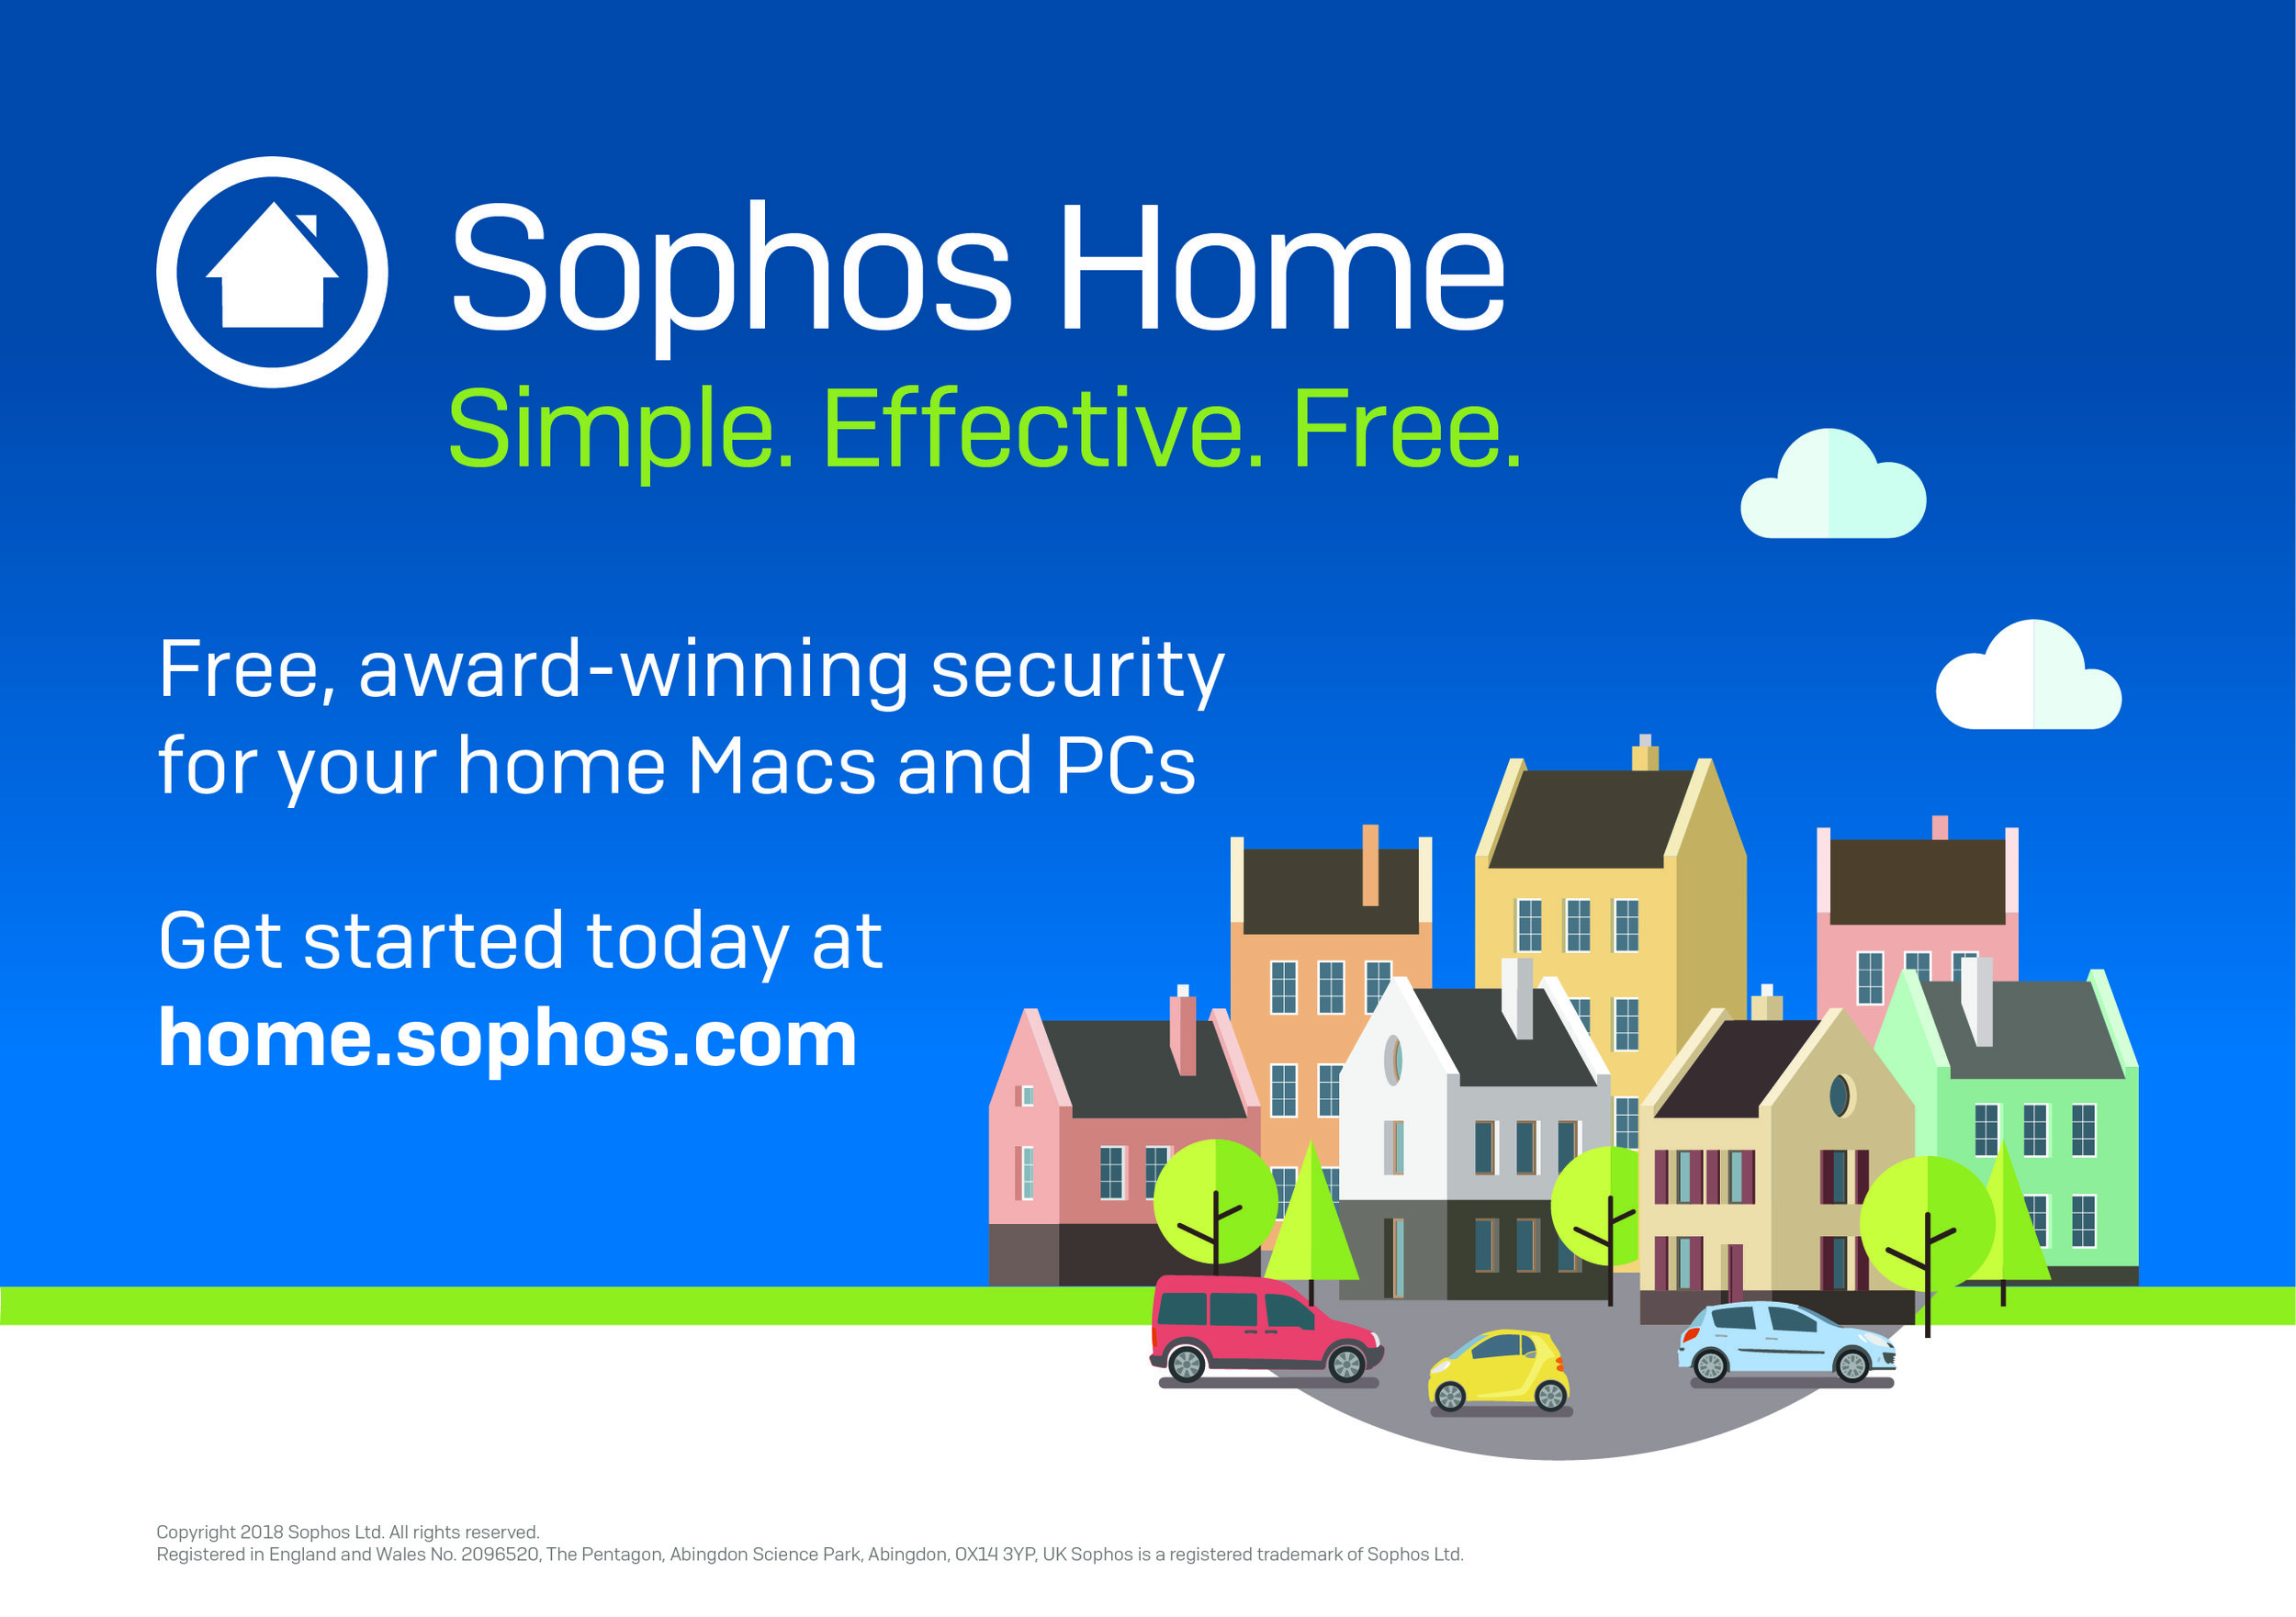 Sophos Home Case Study Book Ad 220x155mm.jpg